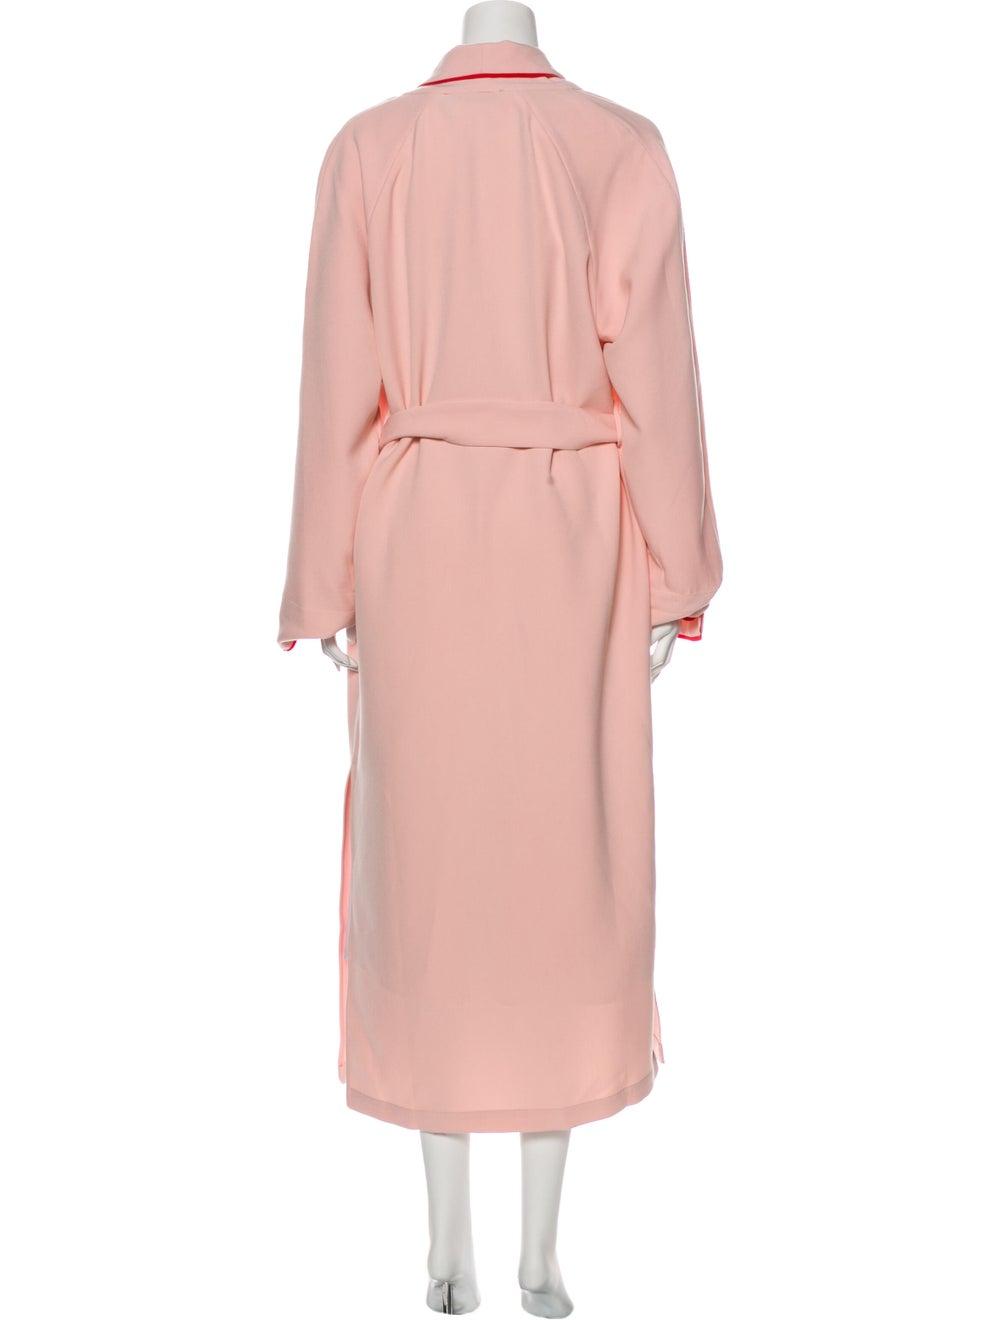 Sleeper Trench Coat Pink - image 3